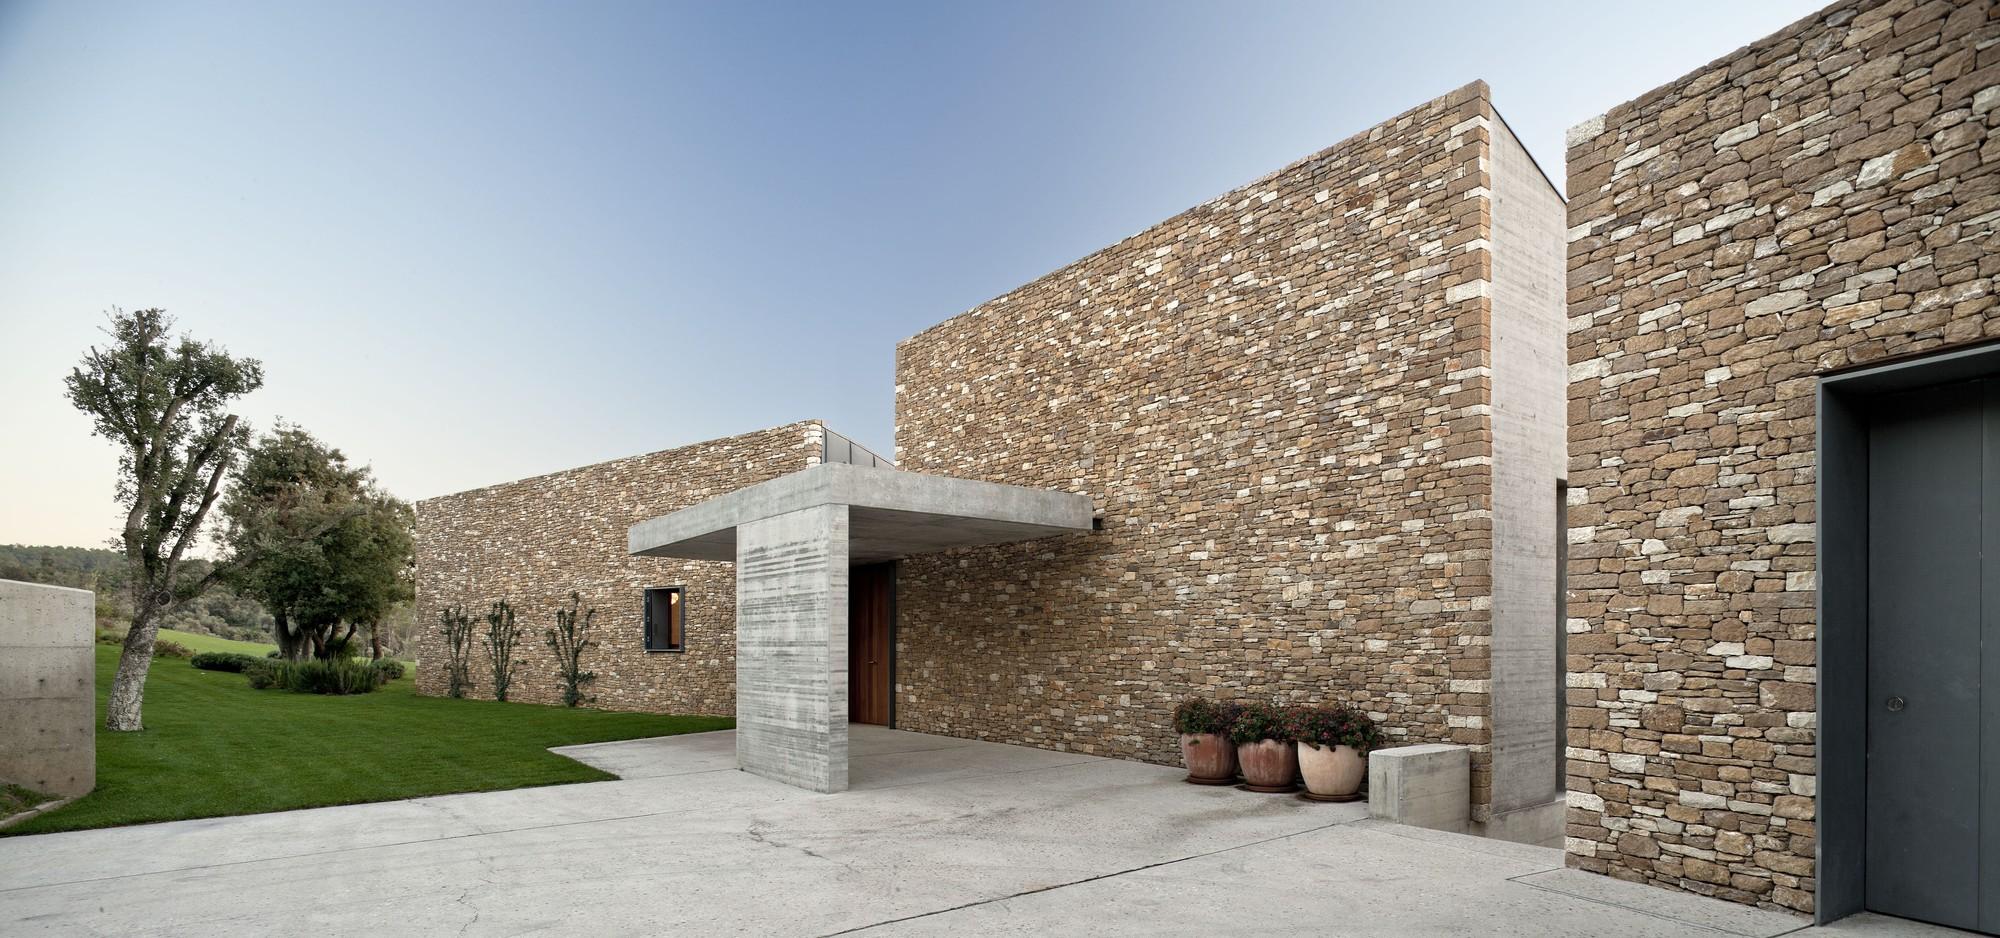 Galeria de casa ampudr n b720 ferm n v zquez arquitectos 3 for Minimalist house escape 4